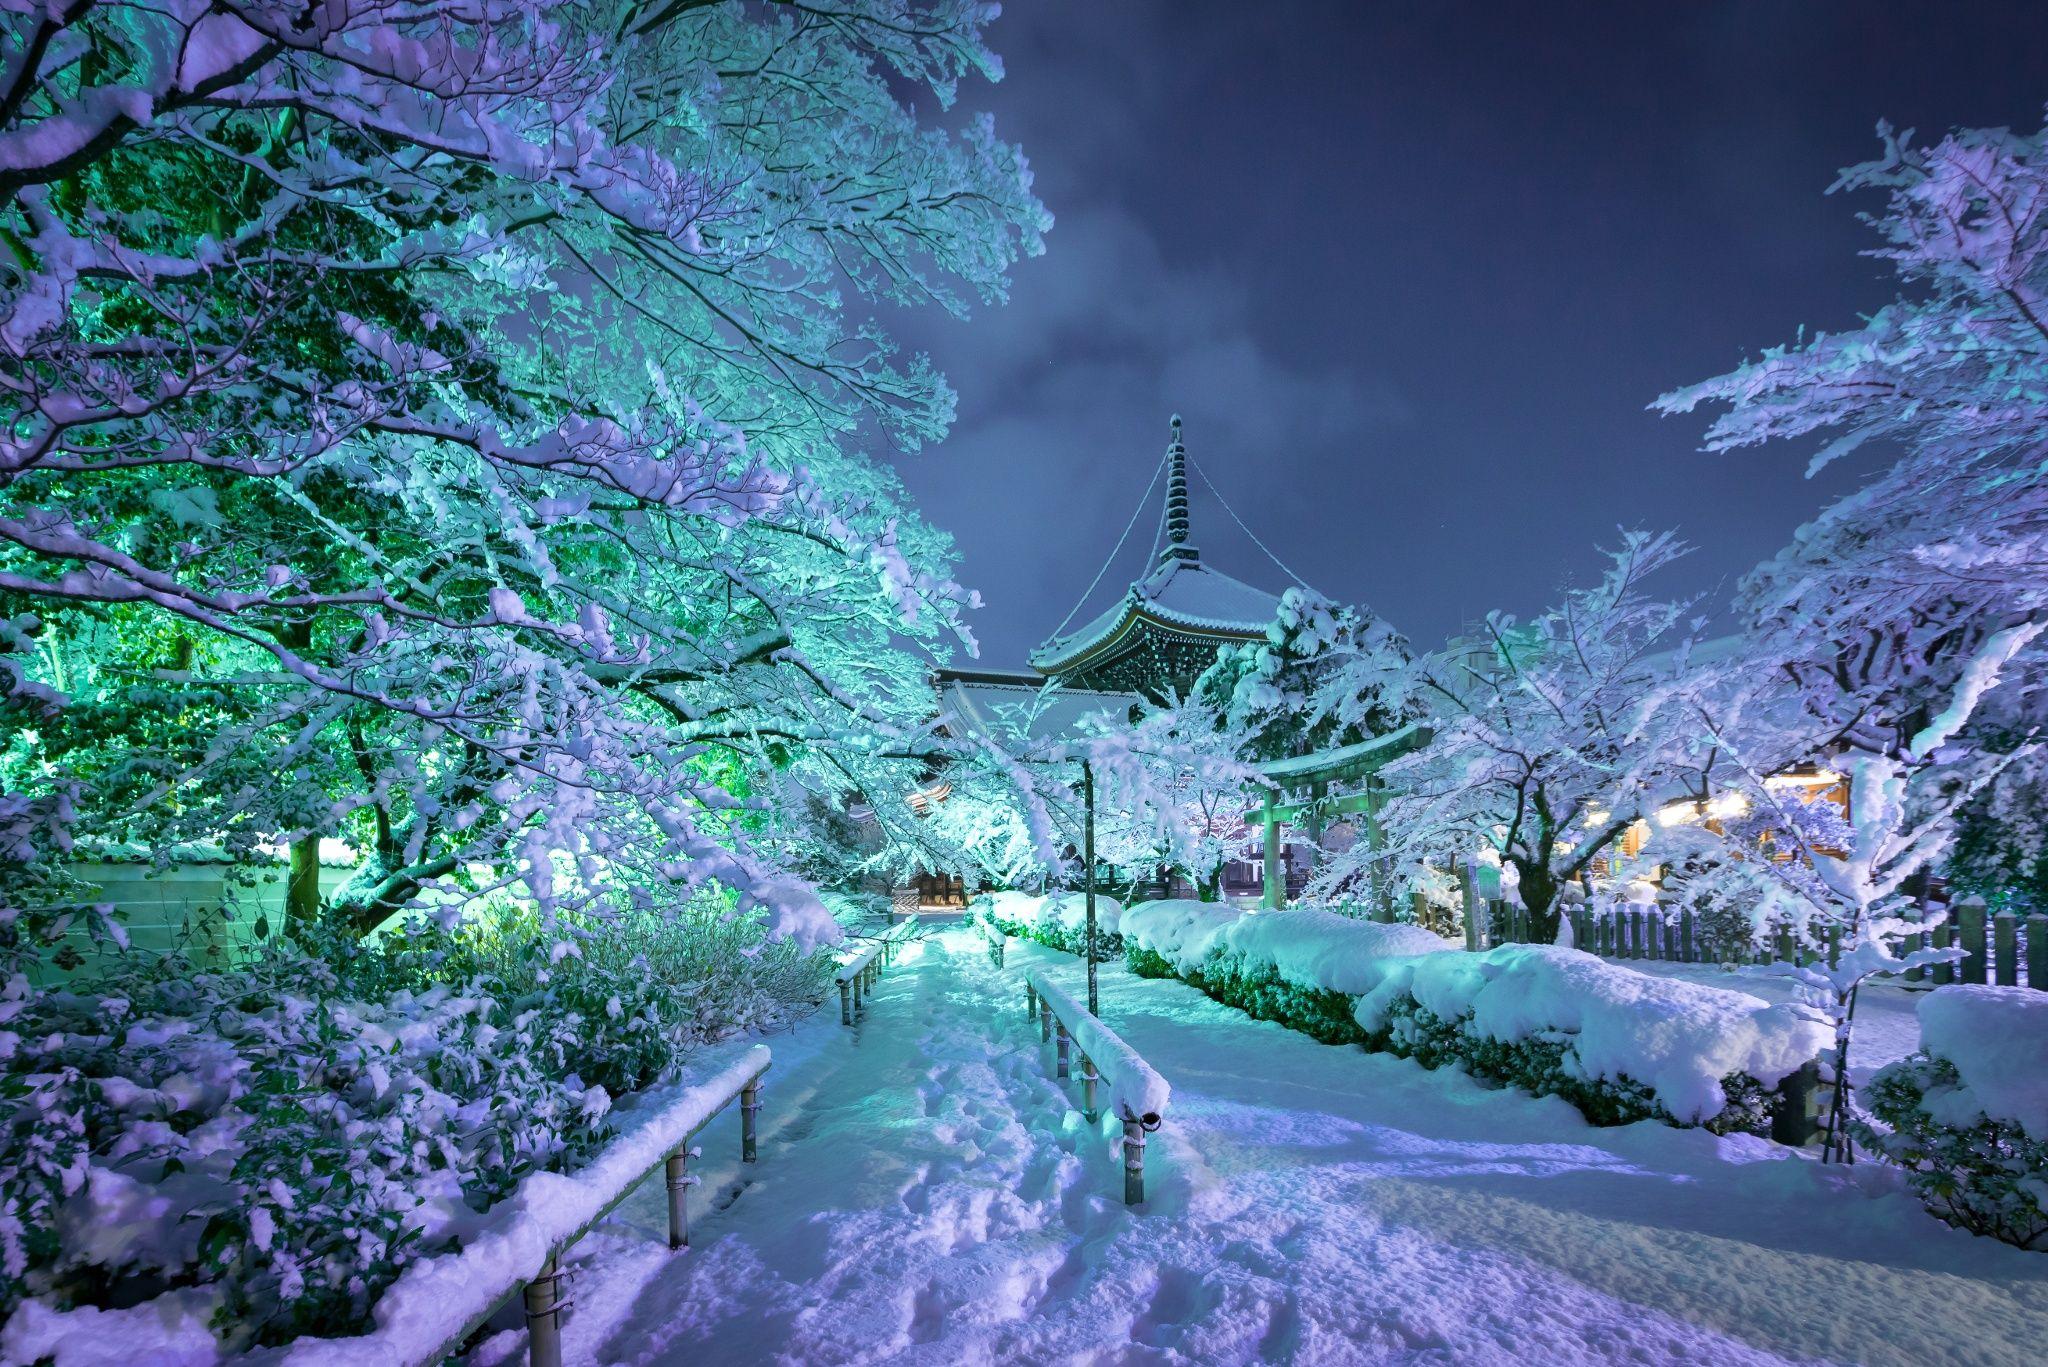 Honpoji Temple,Kyoto Japan by Shinya Murata on 500px